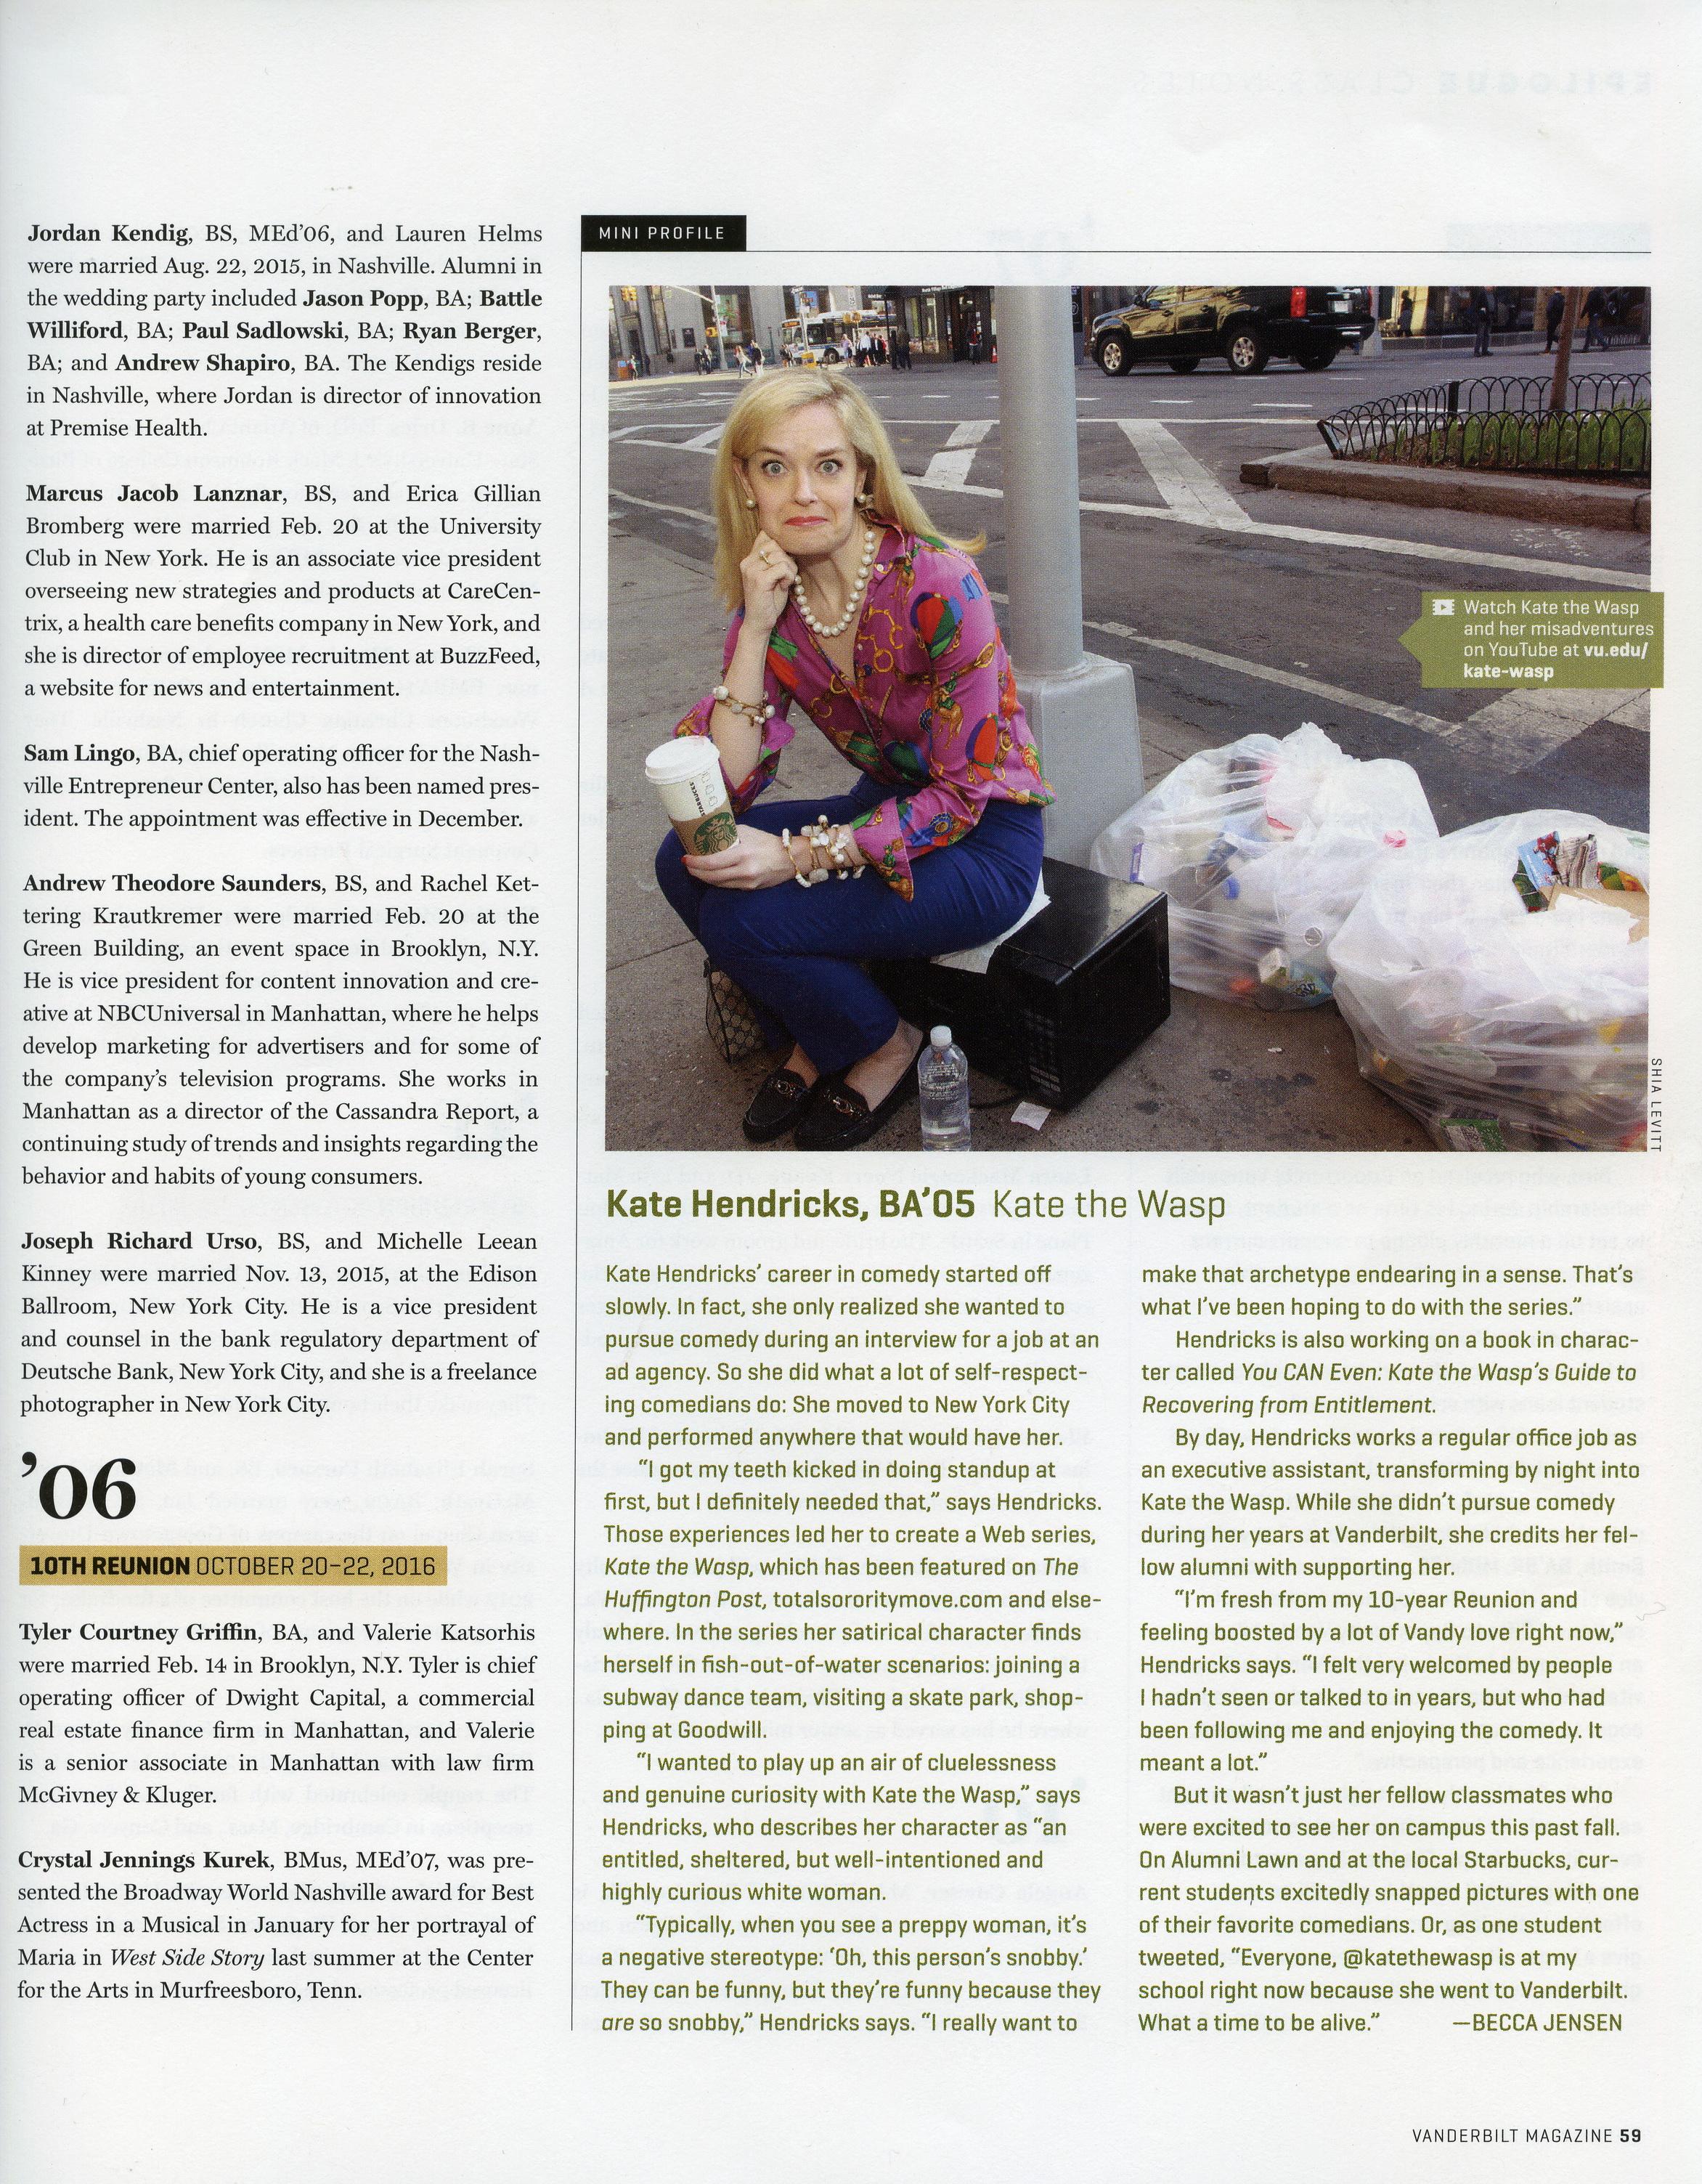 Vanderbilt Magazine